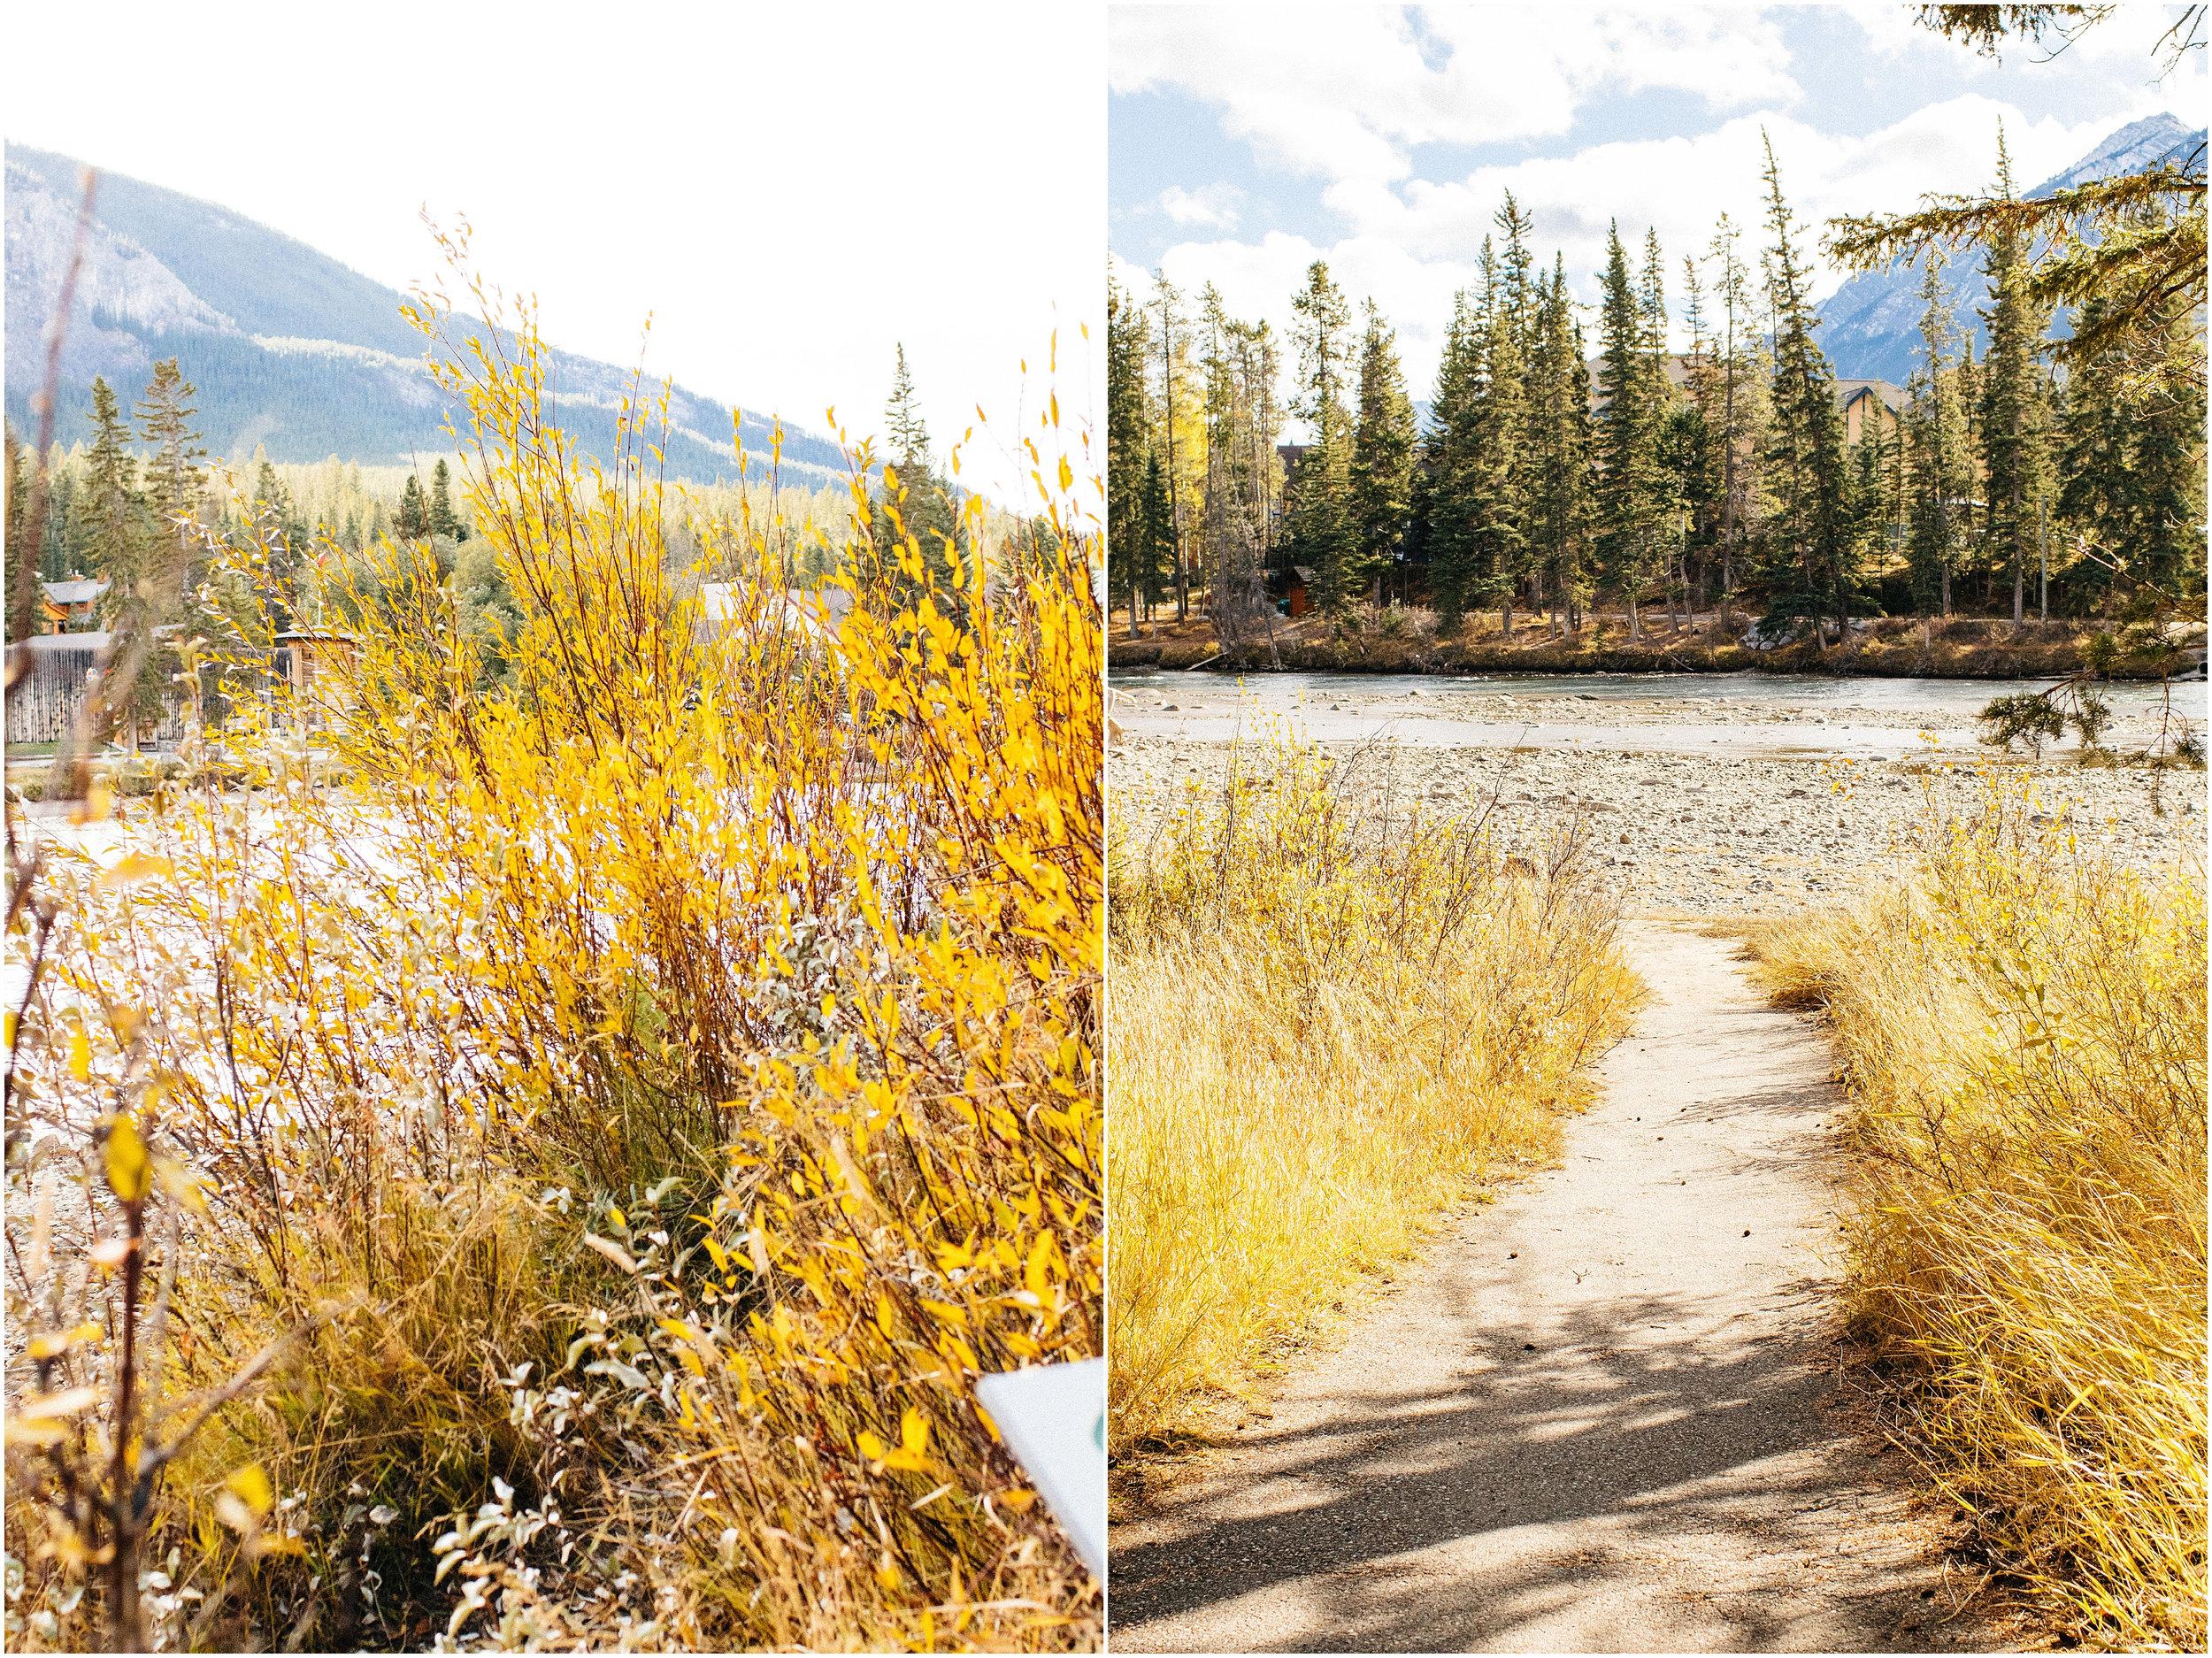 Banff_Travel_Photographer-88.jpg